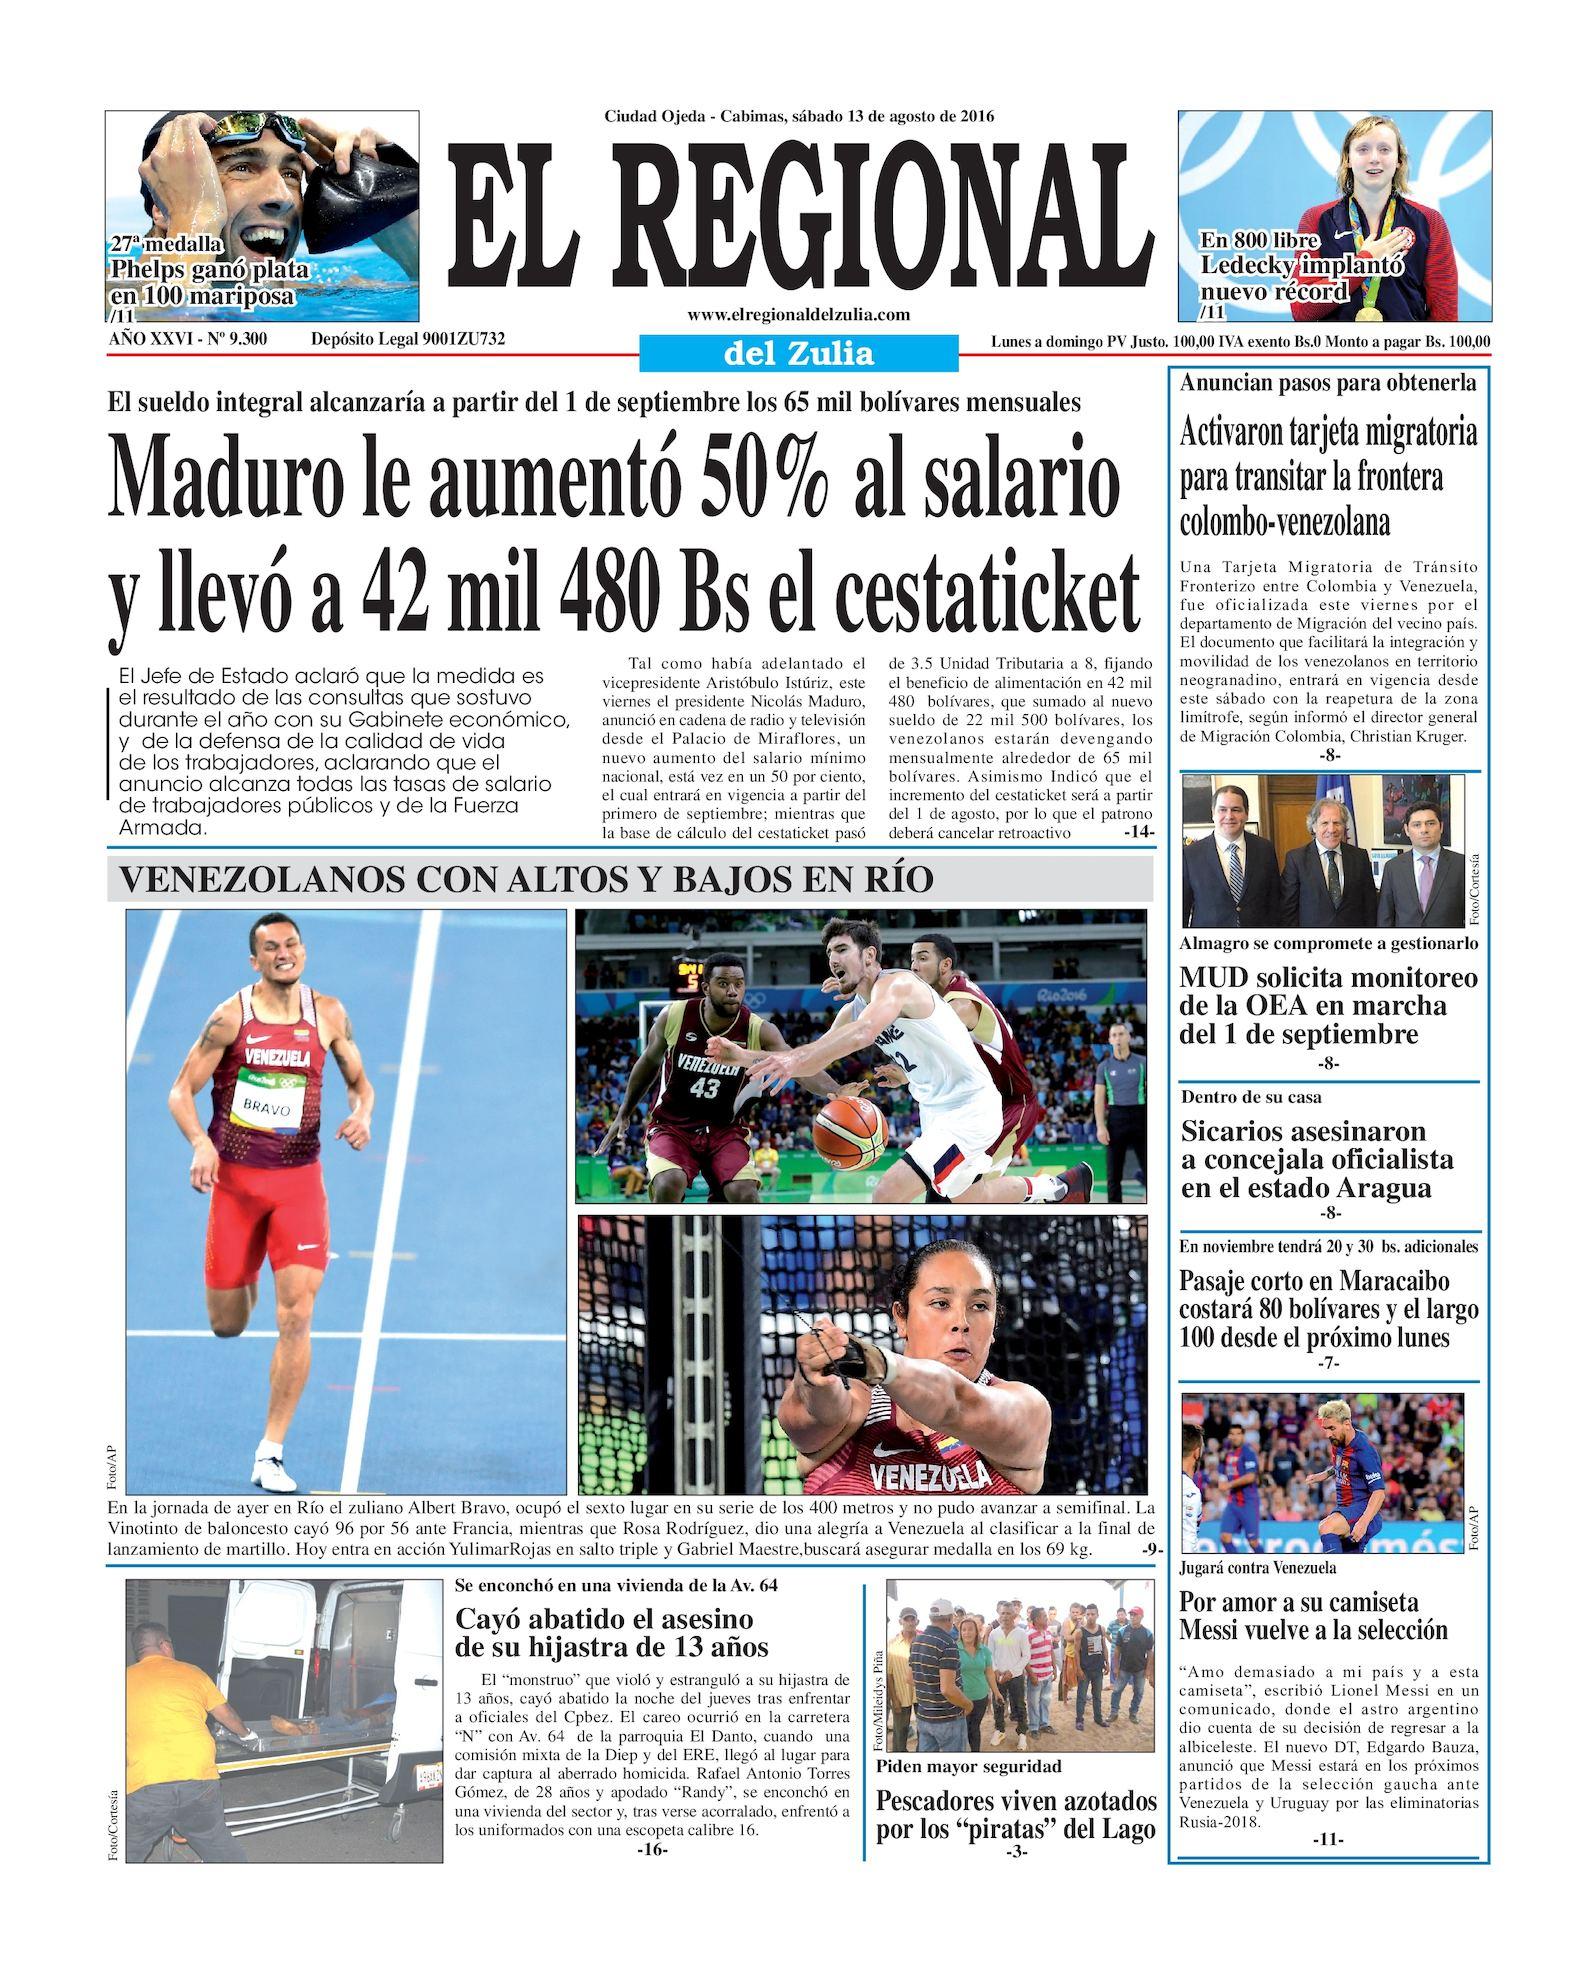 Calaméo El Regional del Zulia 13 08 2016